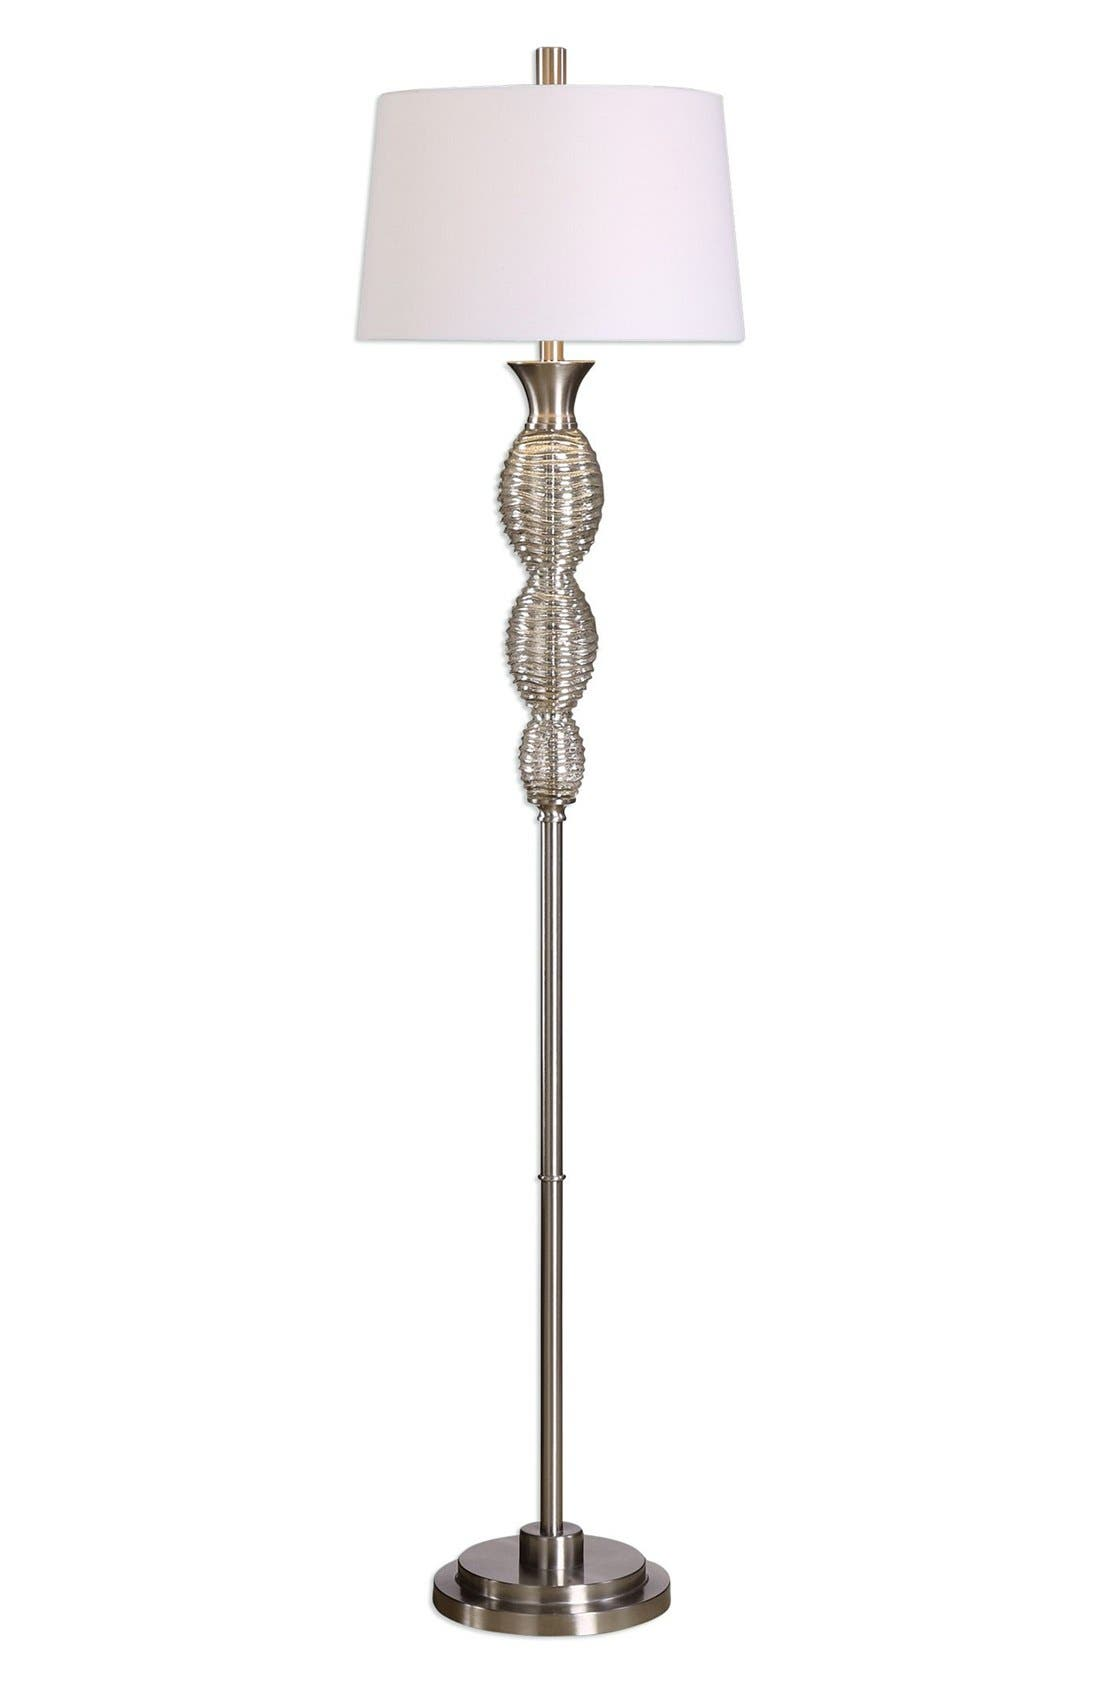 Main Image - Uttermost Mercury Glass Floor Lamp